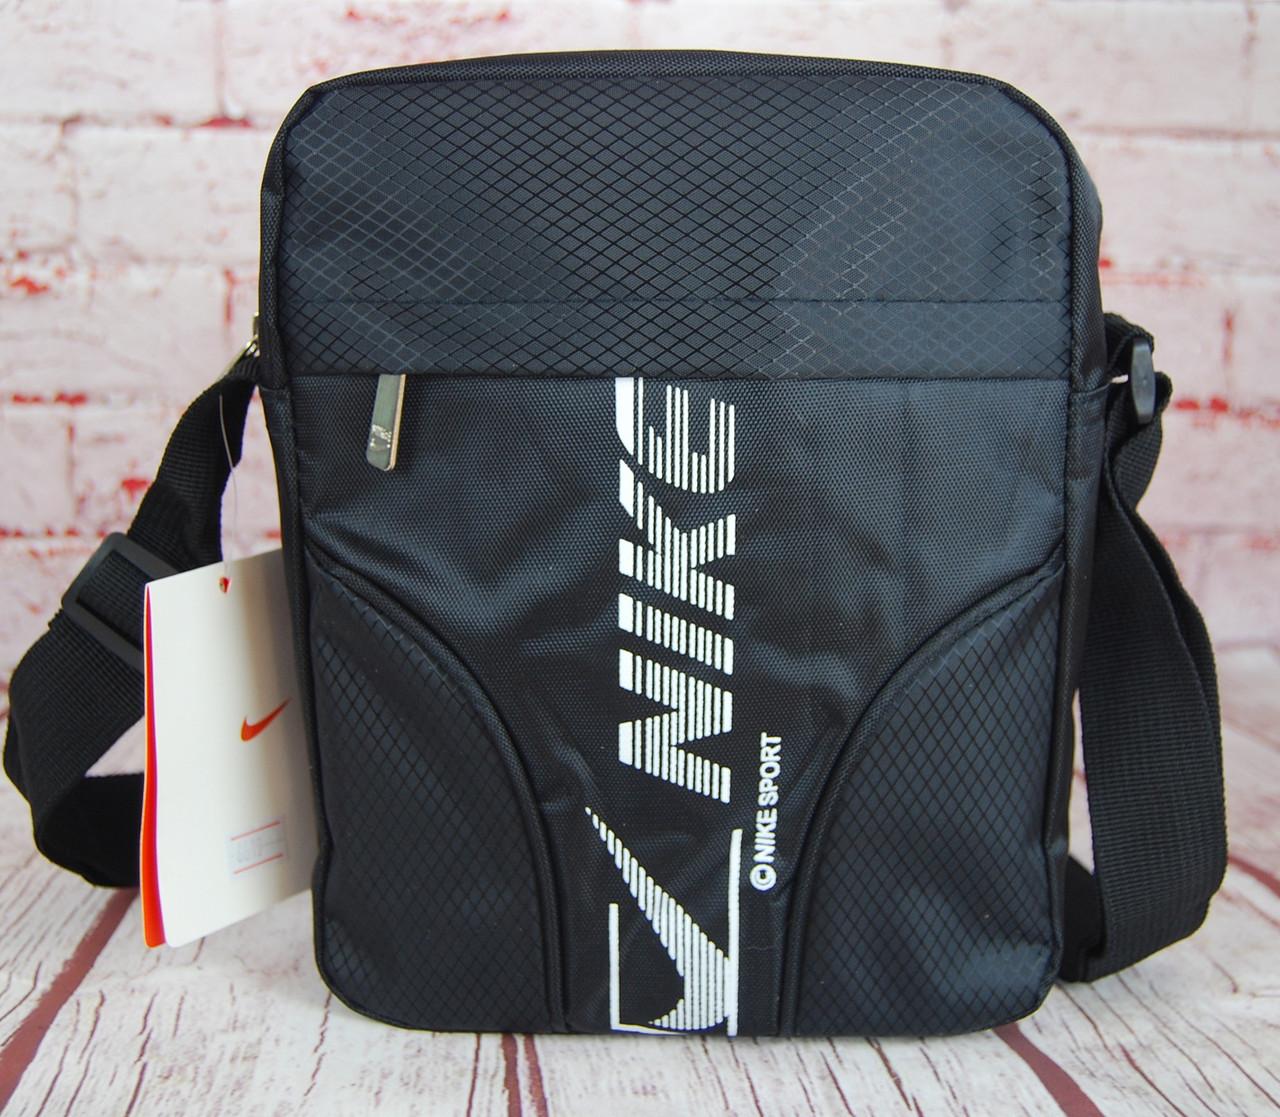 Спортивная сумка-барсетка через плечо Nike .Тканевая сумка. КС15